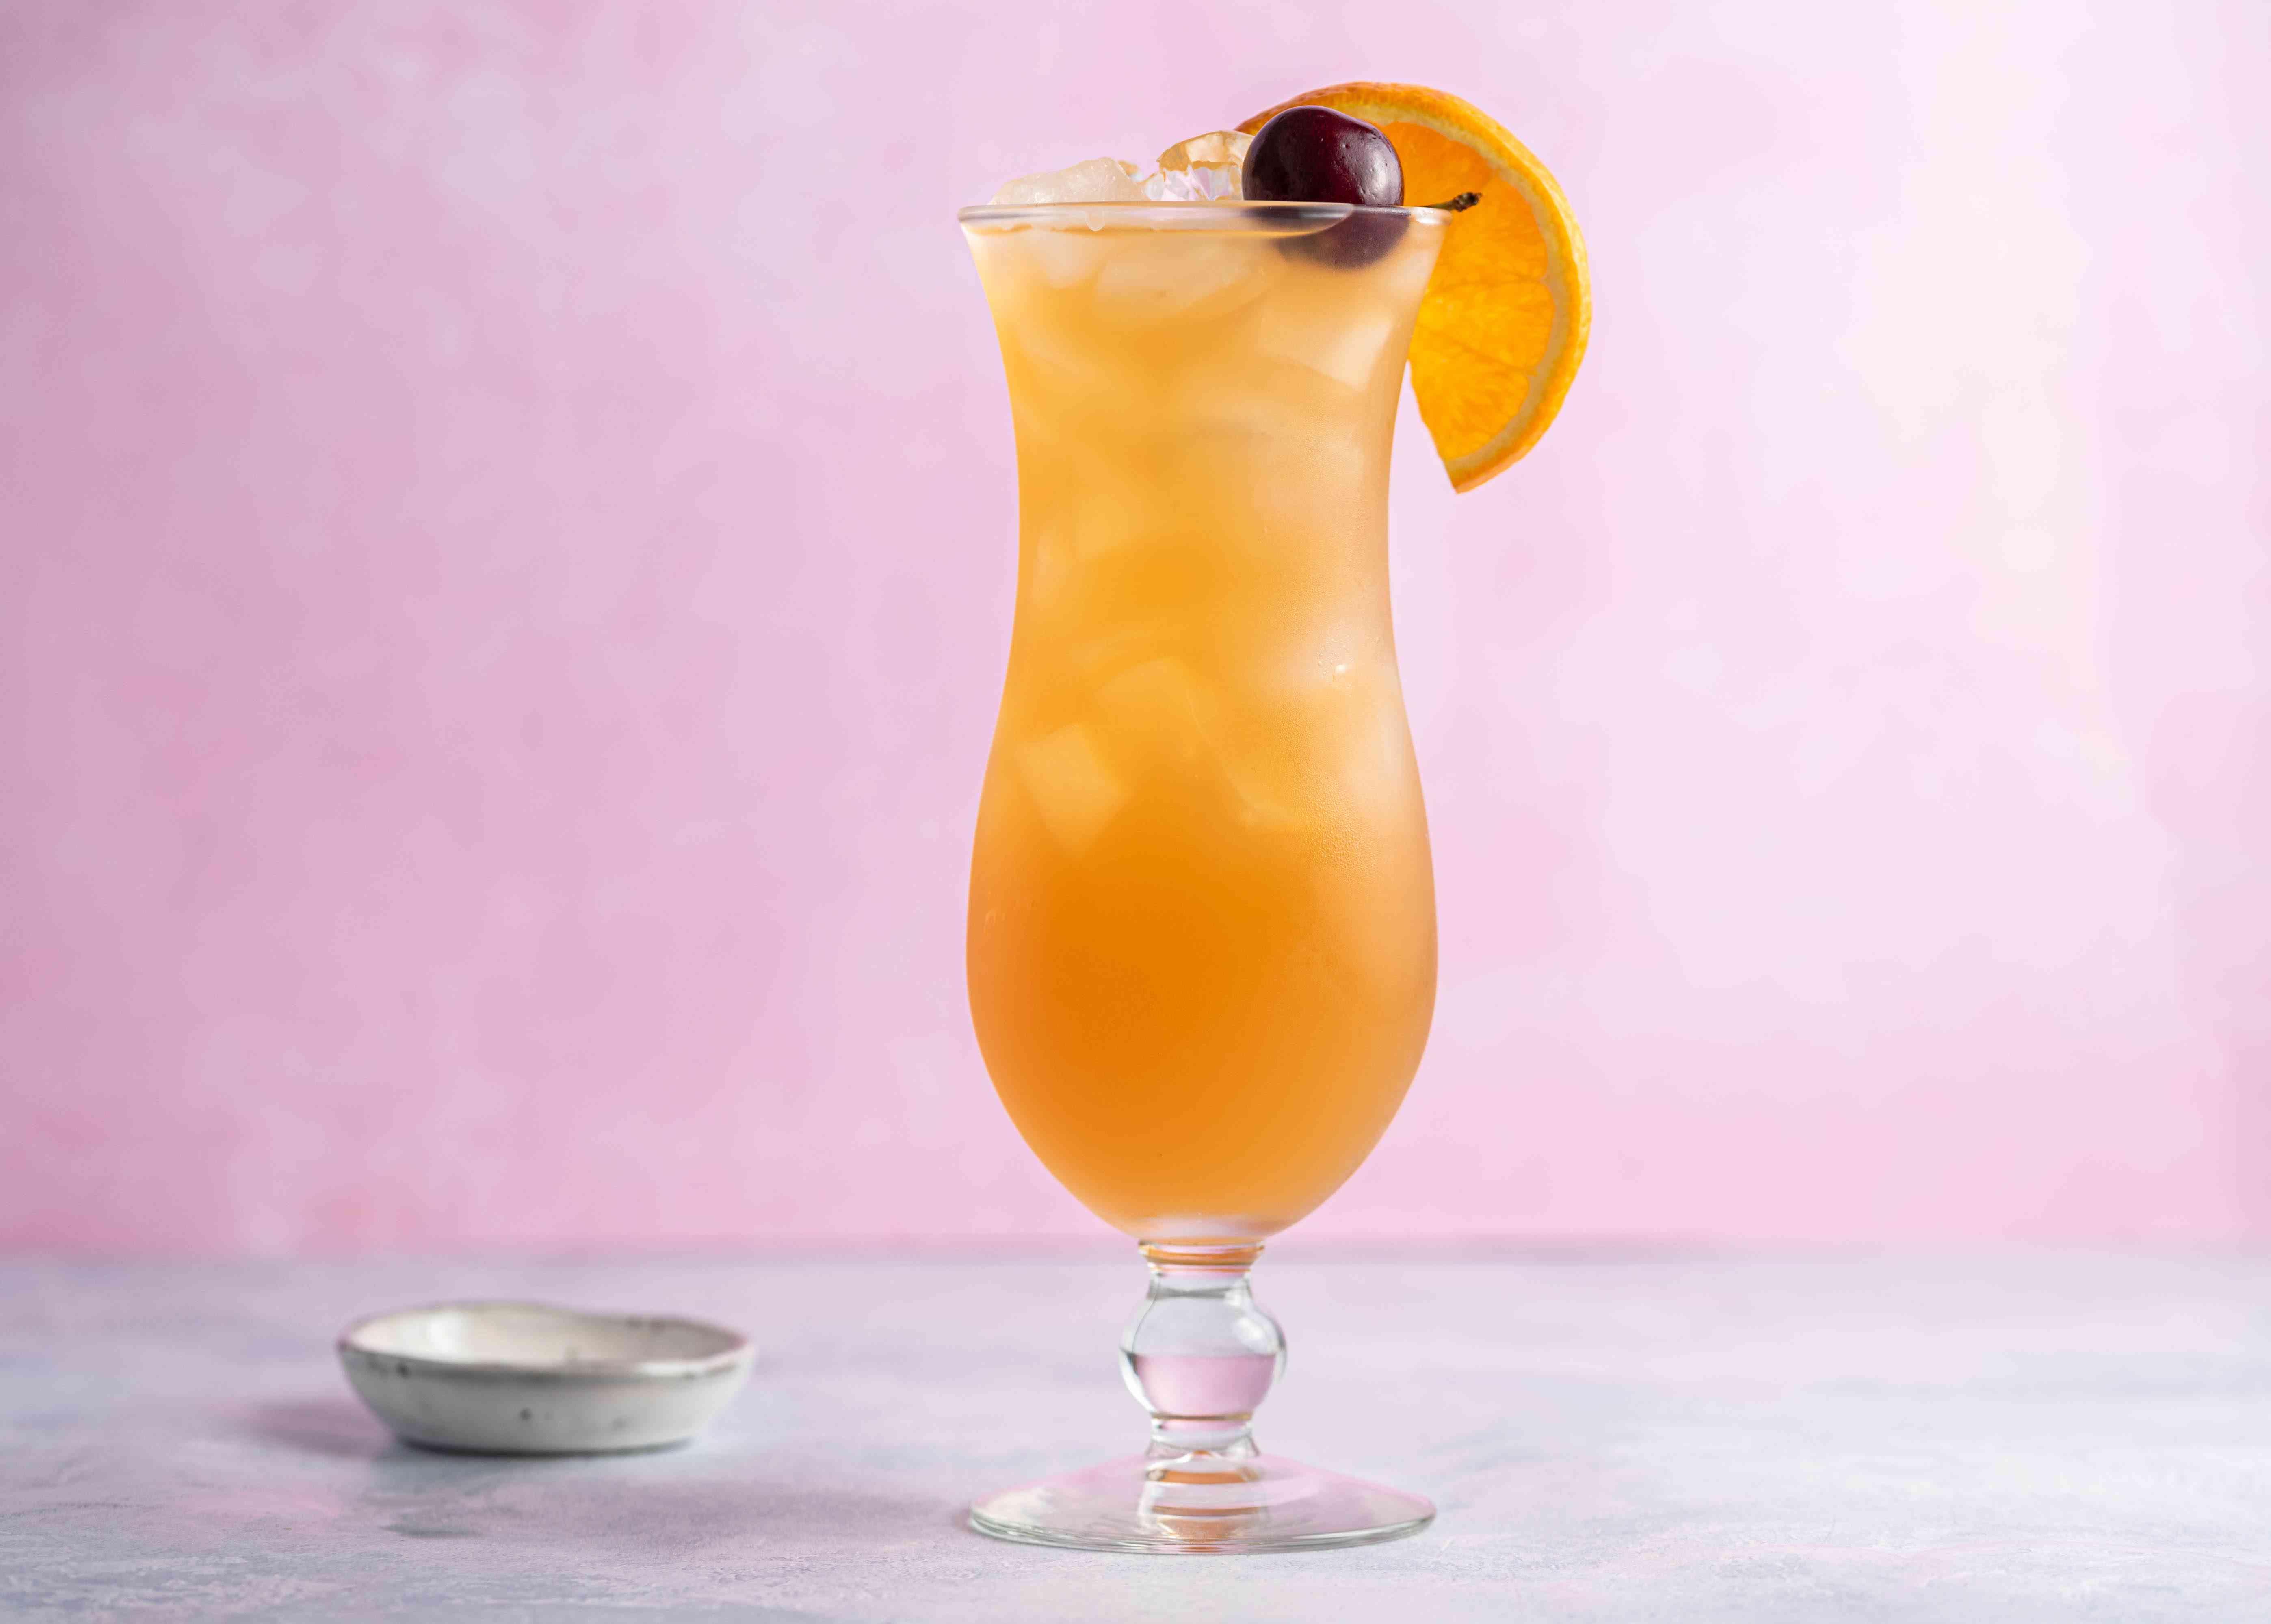 Hurricane cocktail with a cherry and orange slice garnish